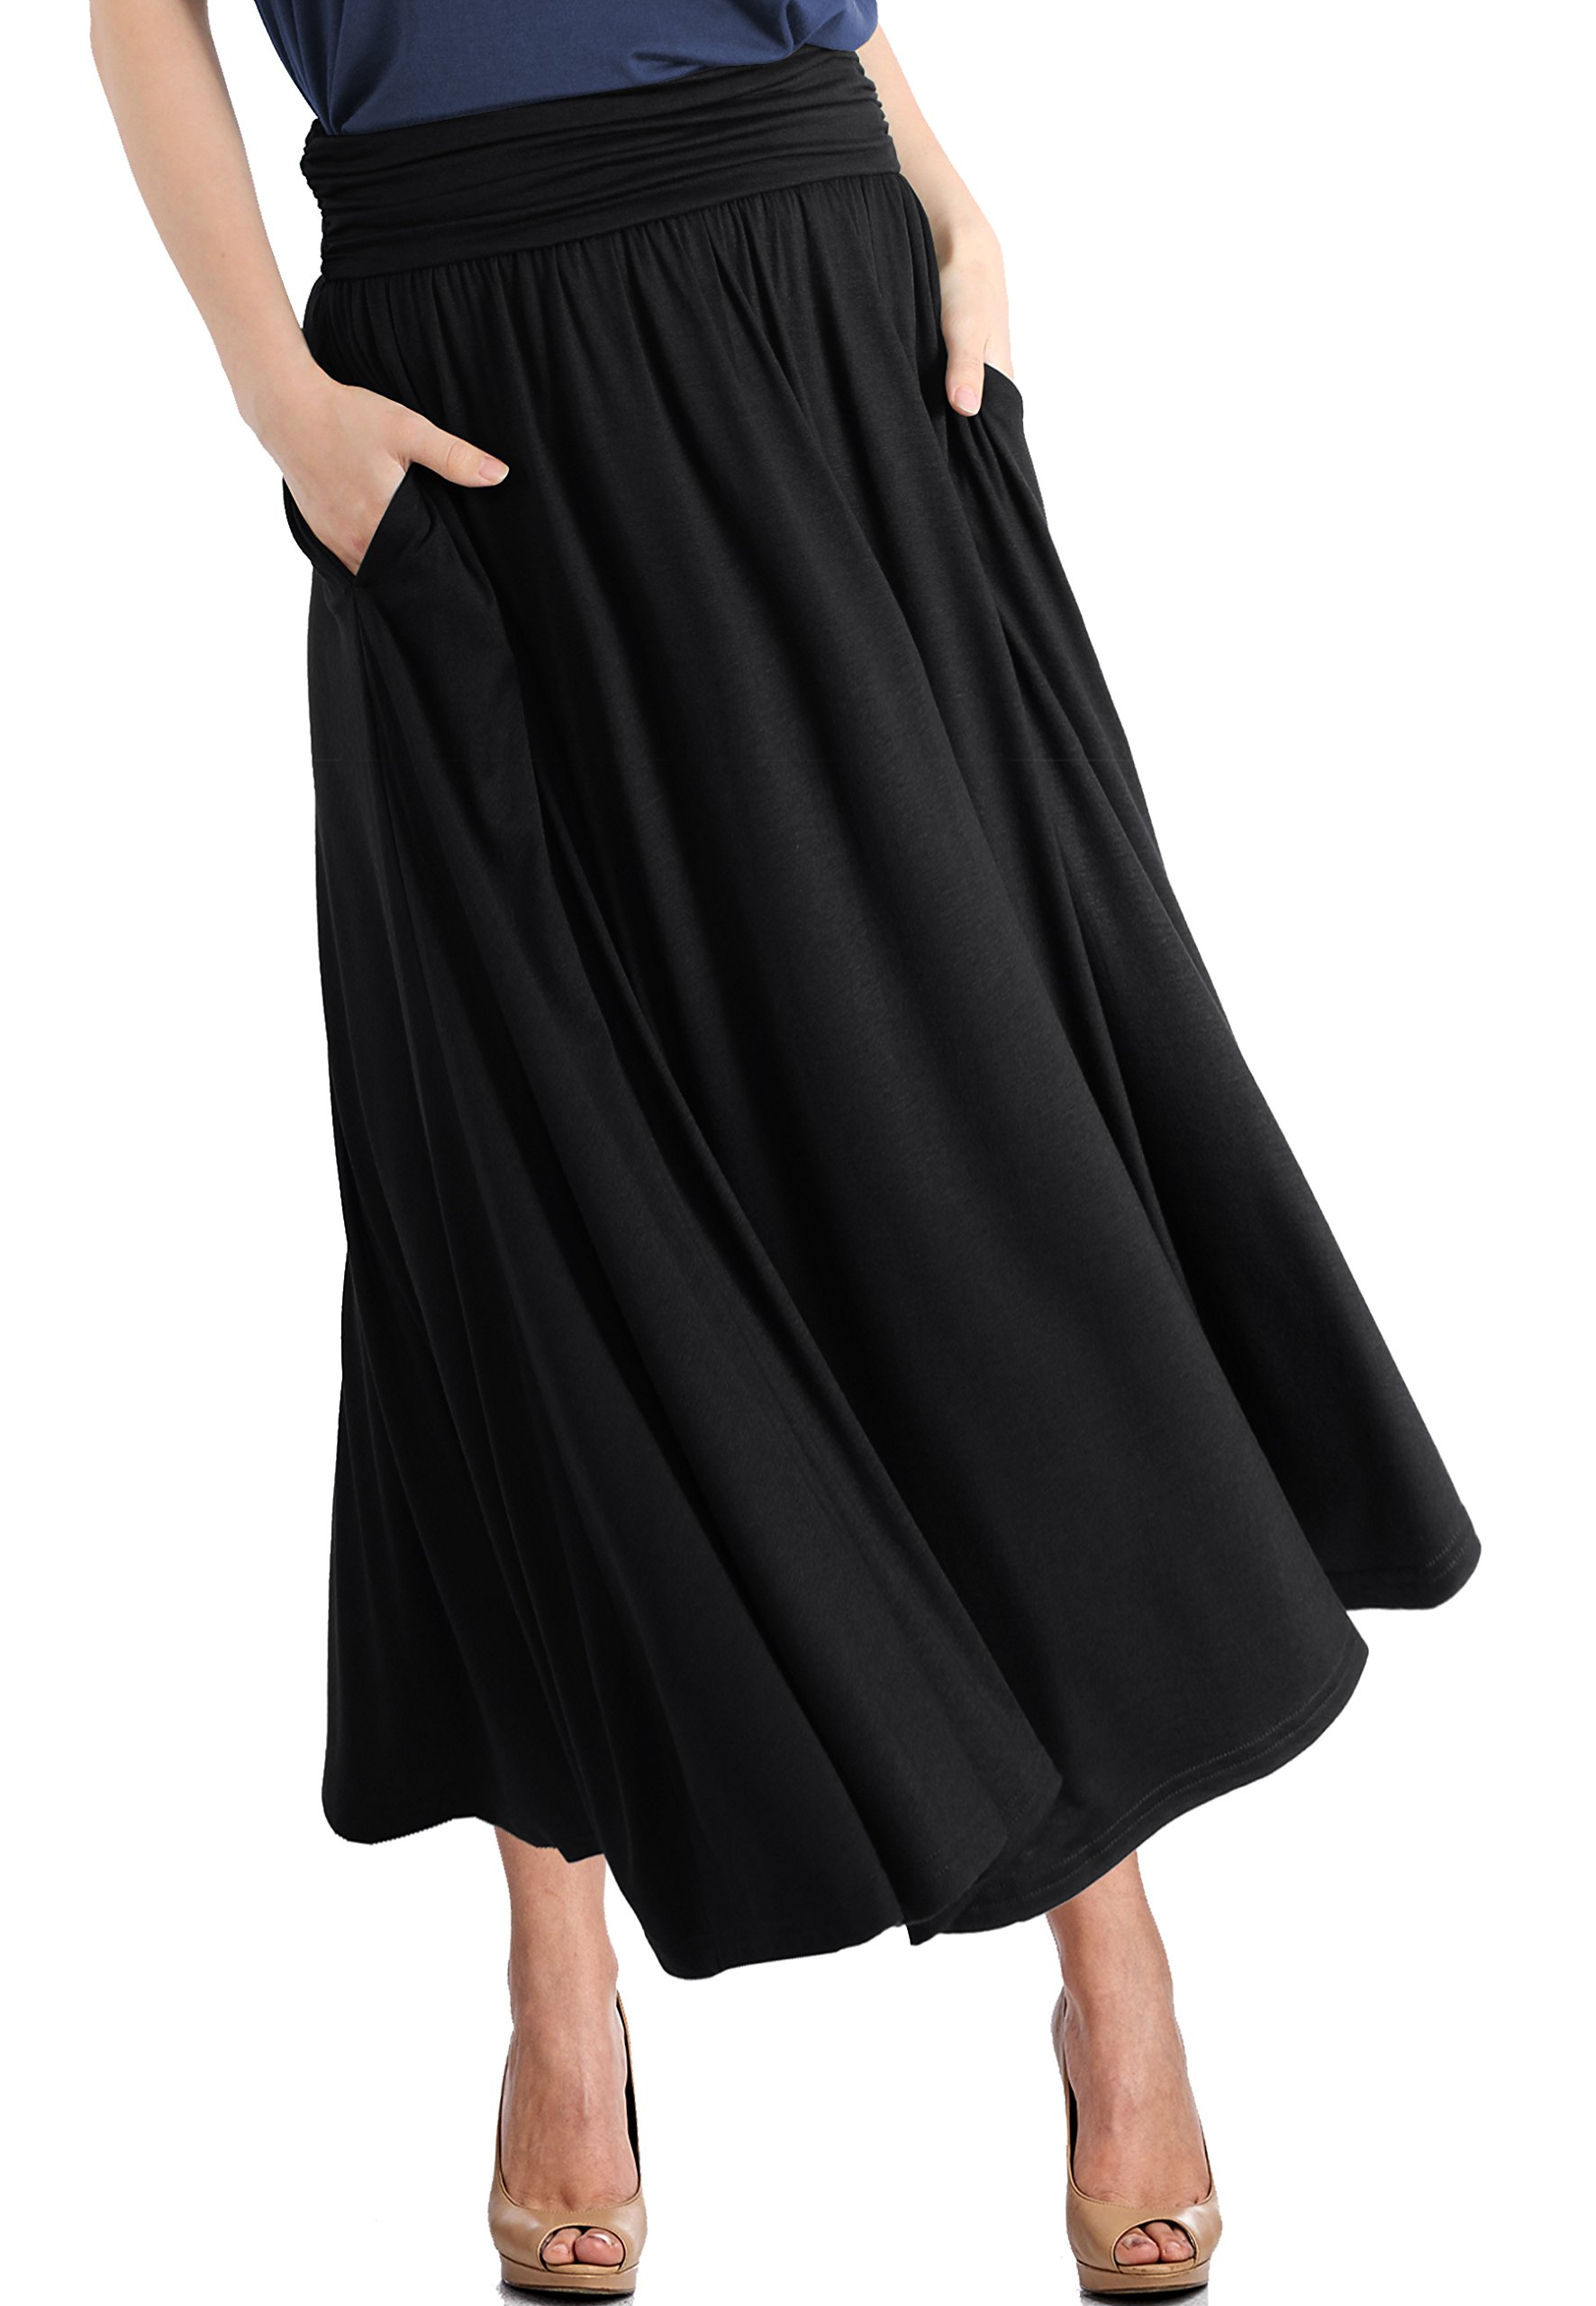 e8dd3a854b5 Joa Folded Skirt Fit And Flare Dress - Data Dynamic AG